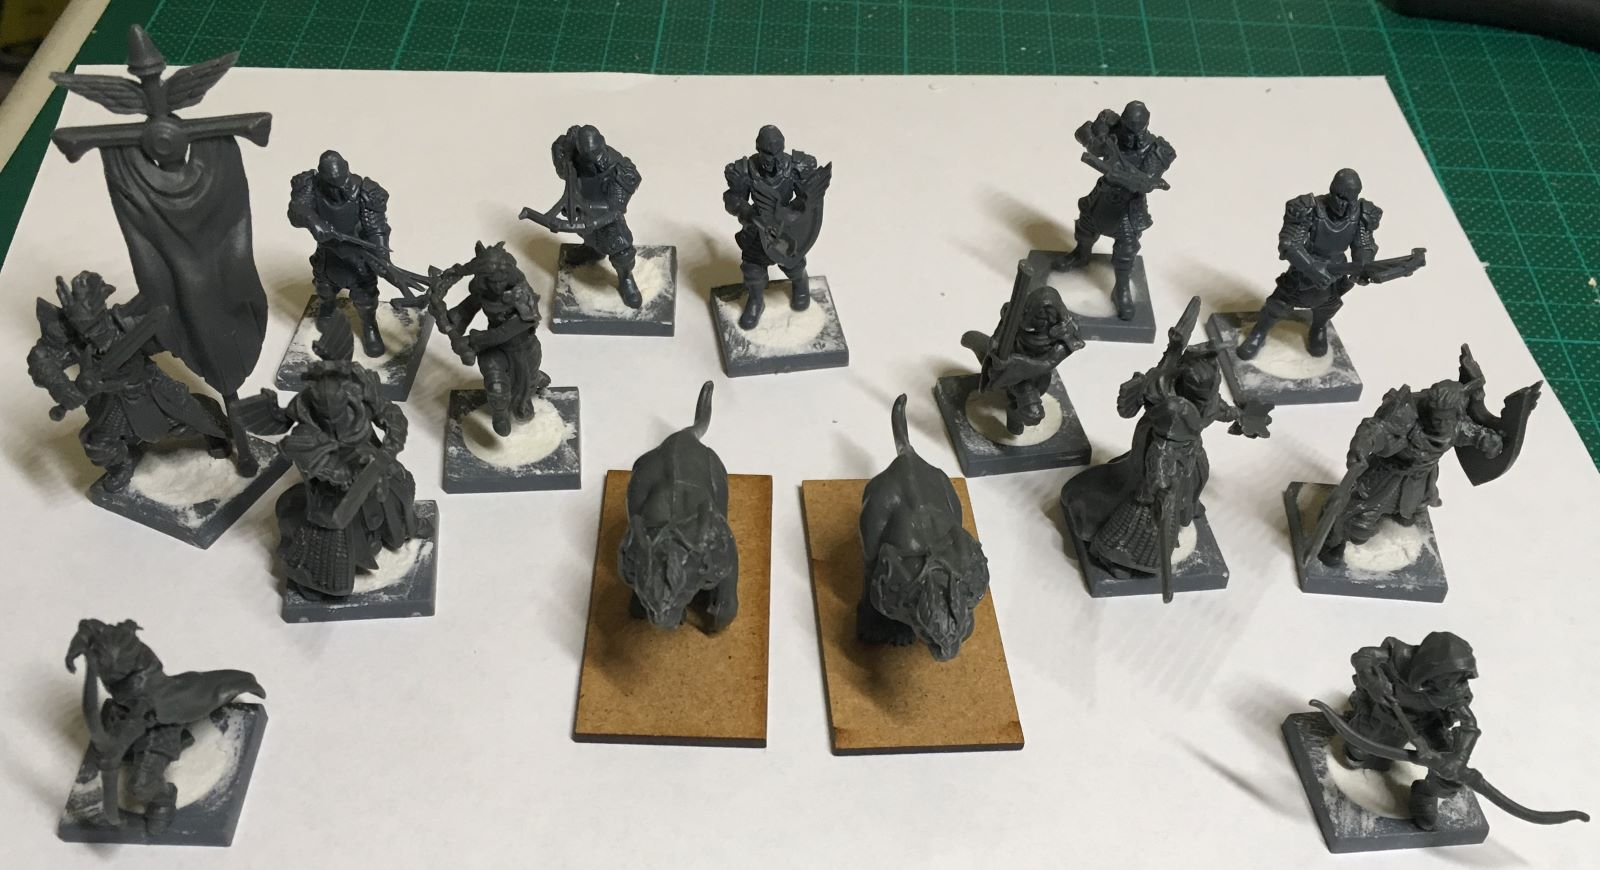 Assembling Kings of War Vanguard Basileans Warband Set 1